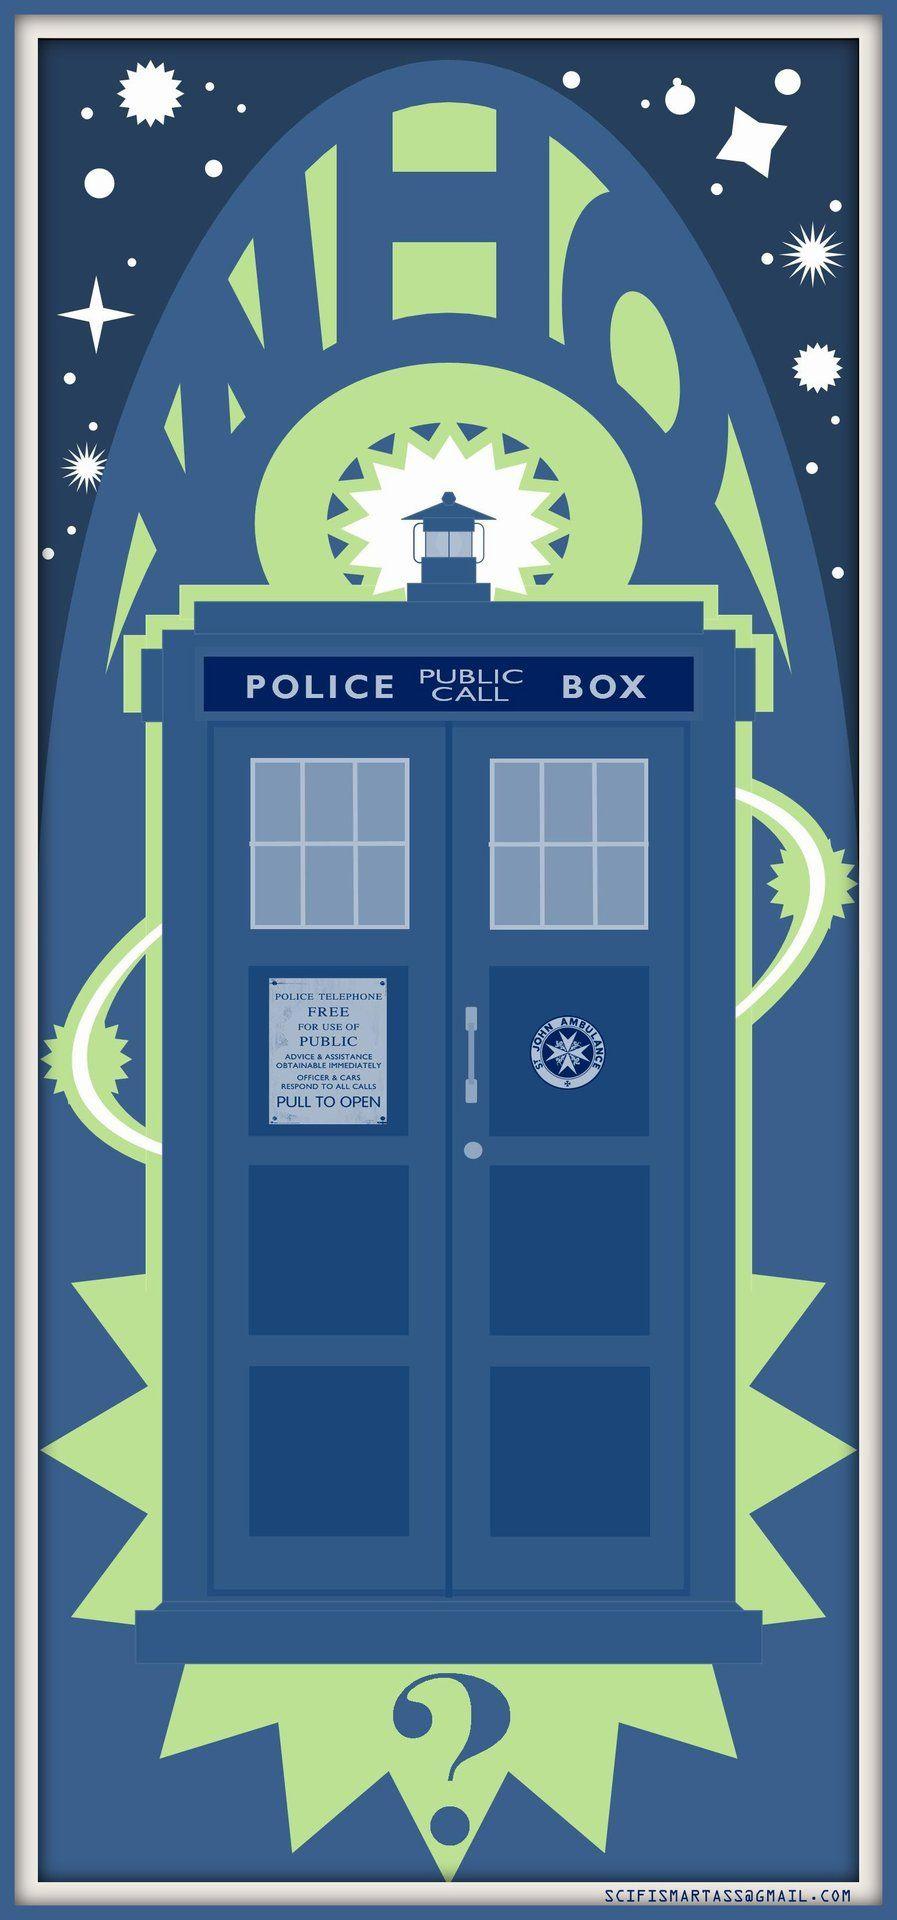 TARDIS.